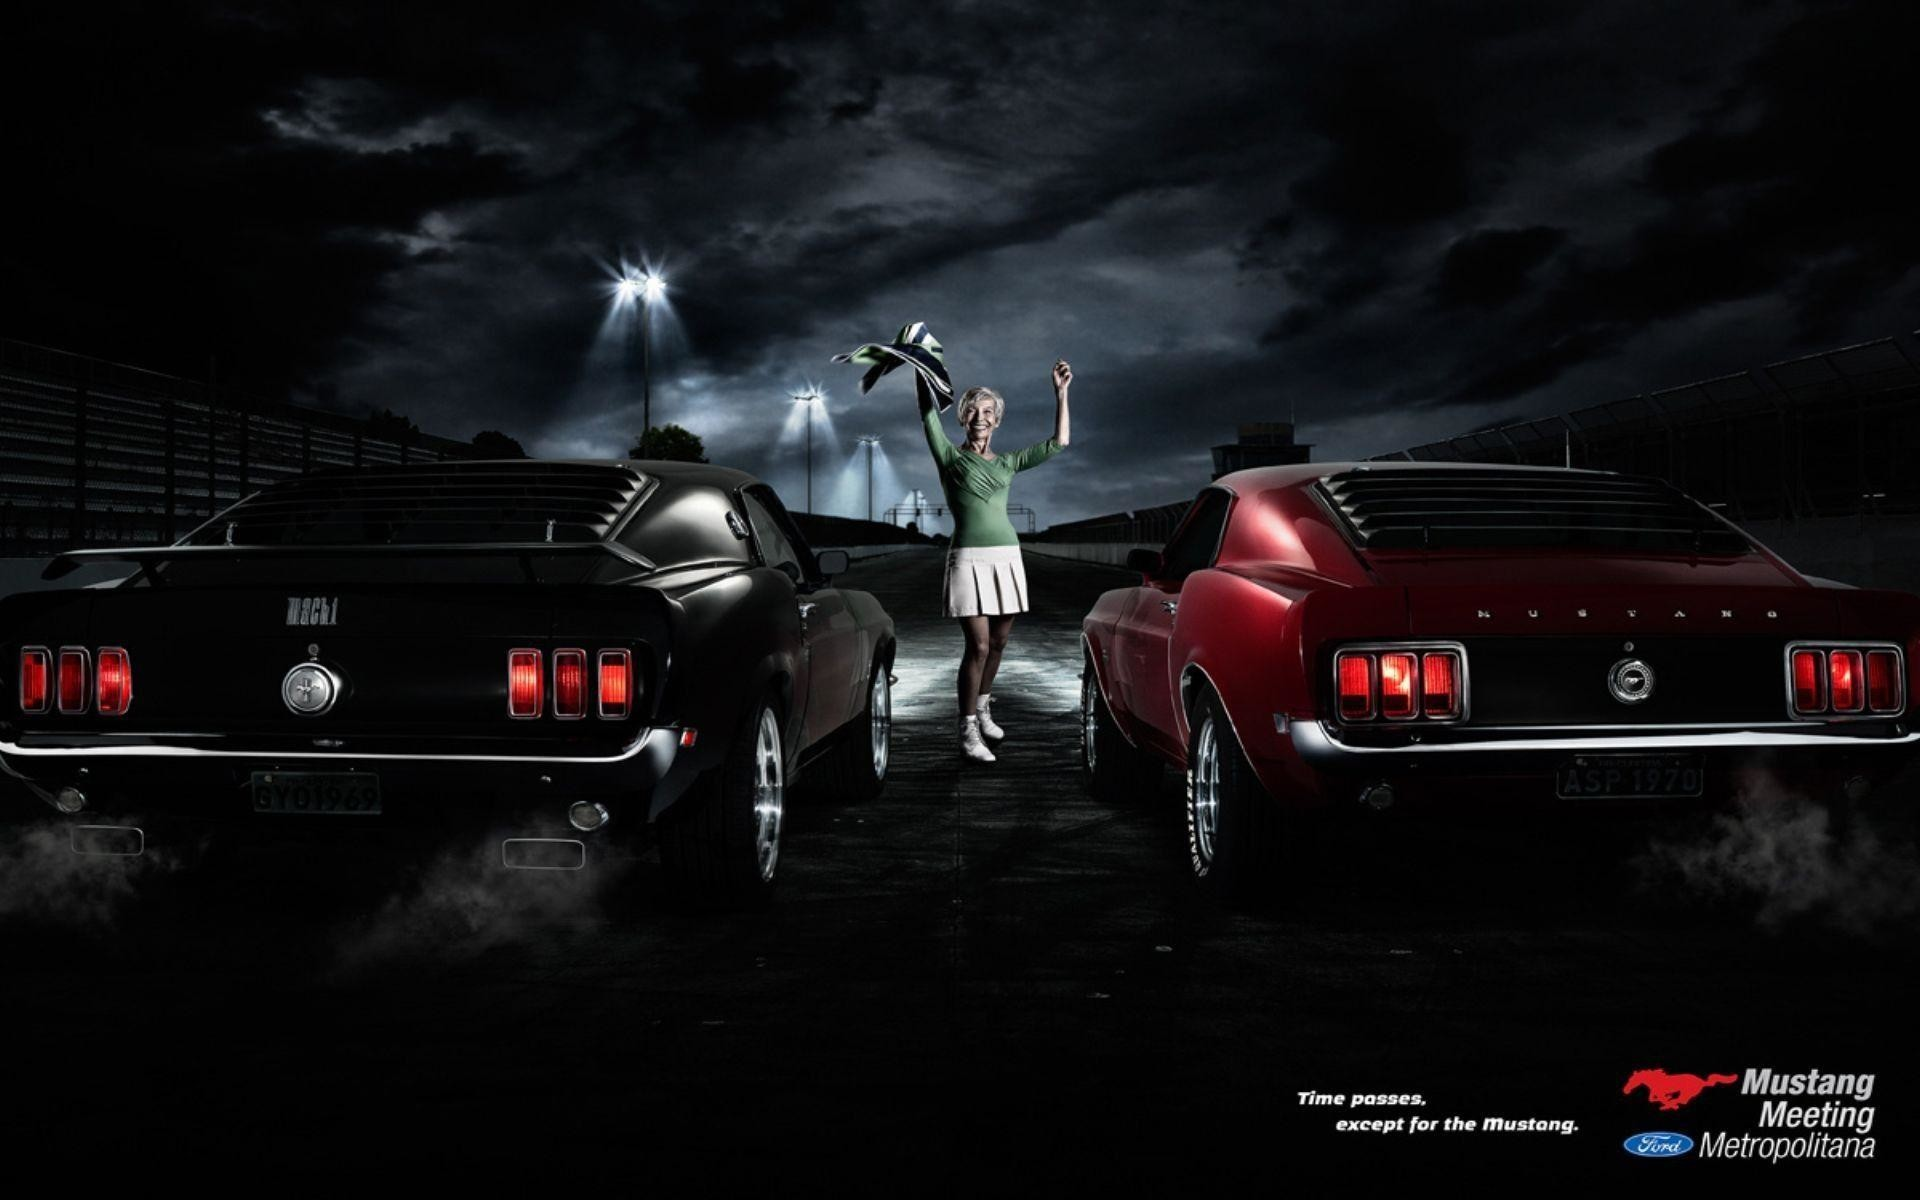 Ford Mustang Logo Wallpaper Hd 97372 | IMGFLASH